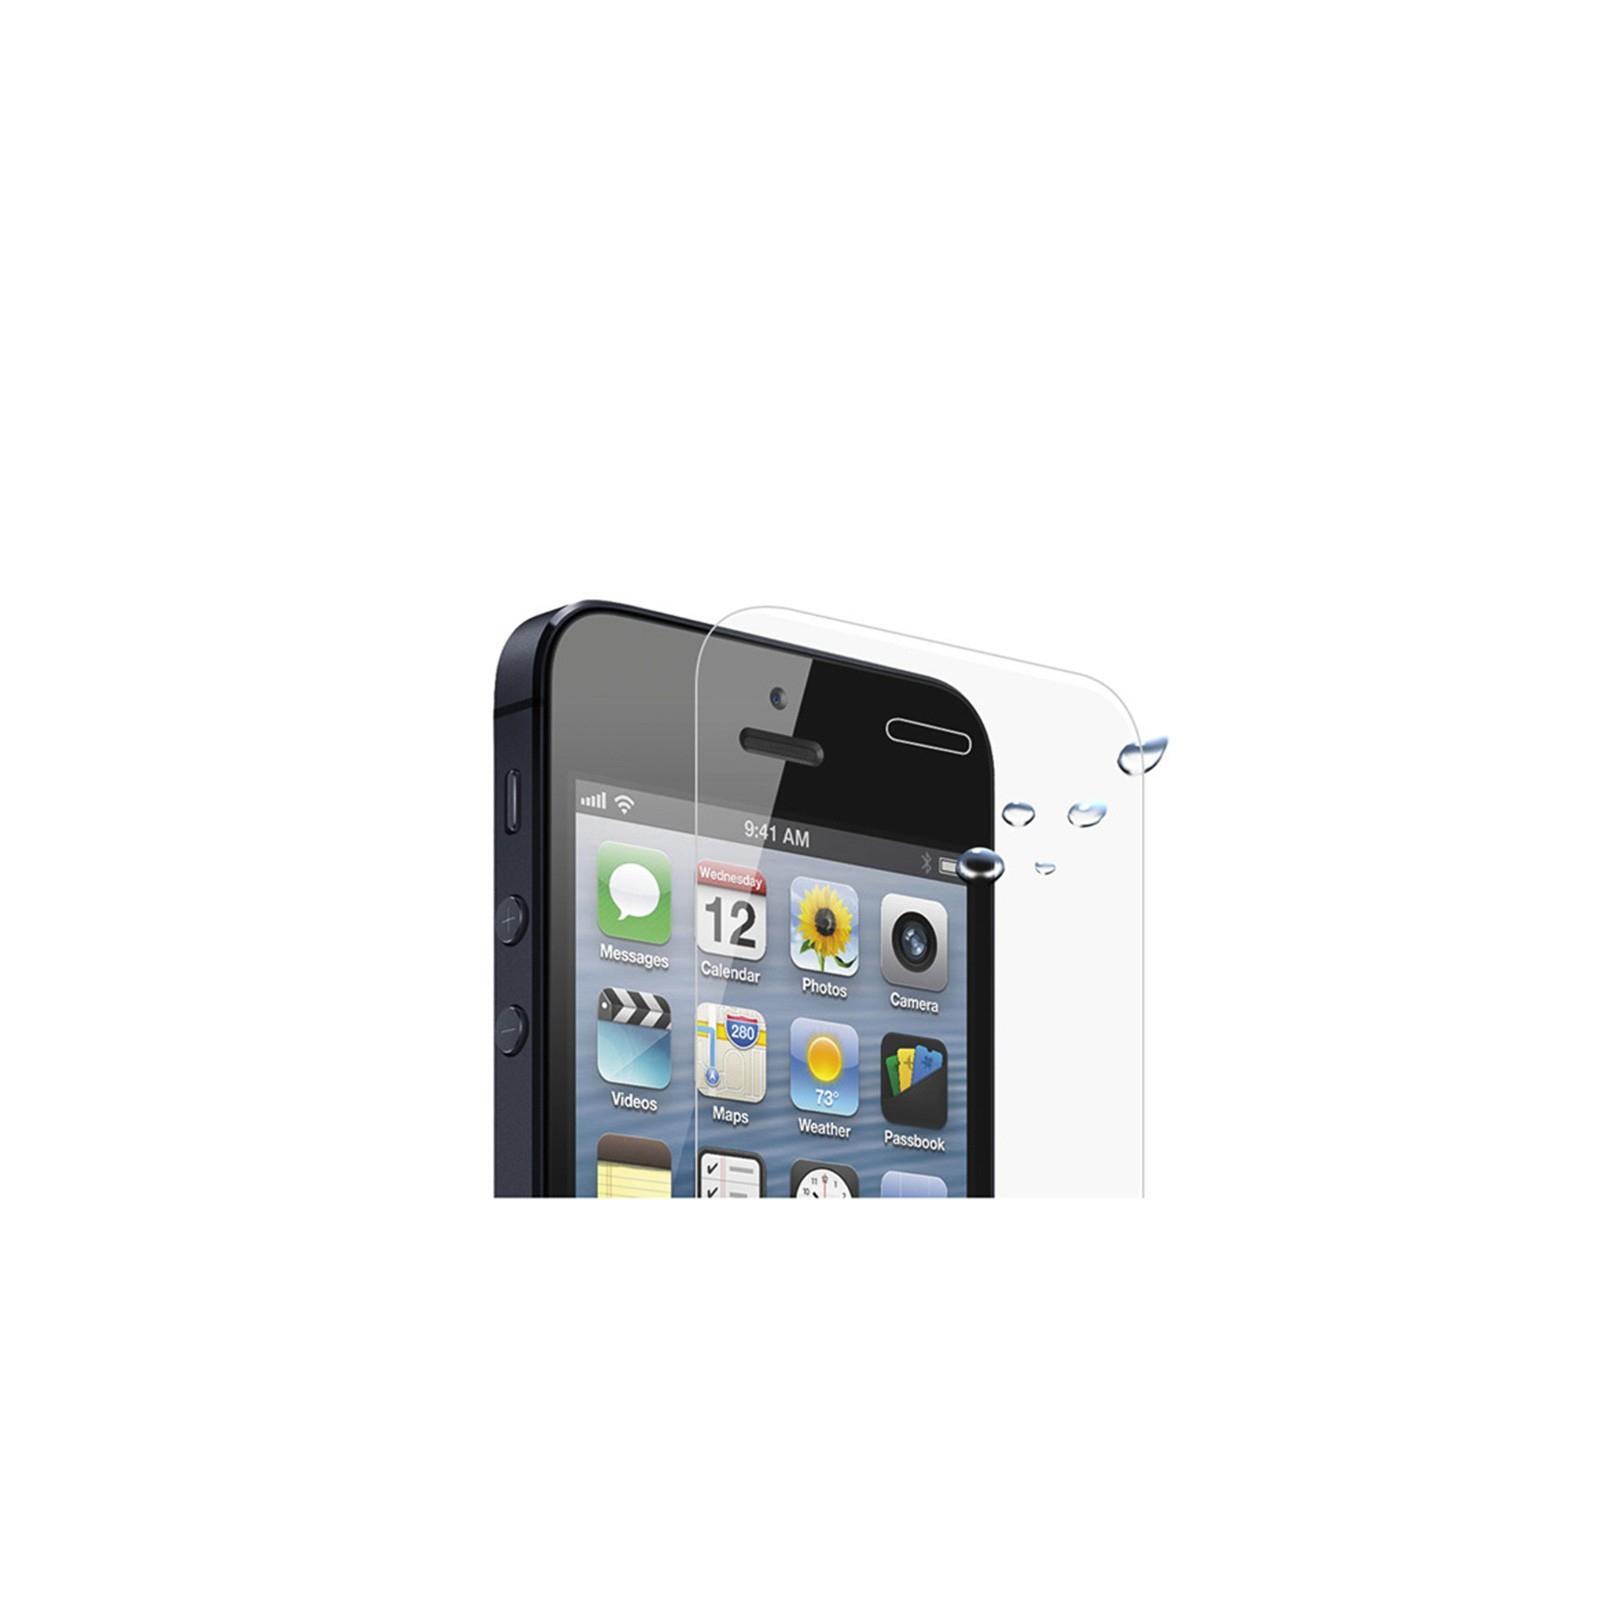 Стекло защитное JCPAL Glass Film для iPhone 5S/5C/5 (JCP3266) изображение 2